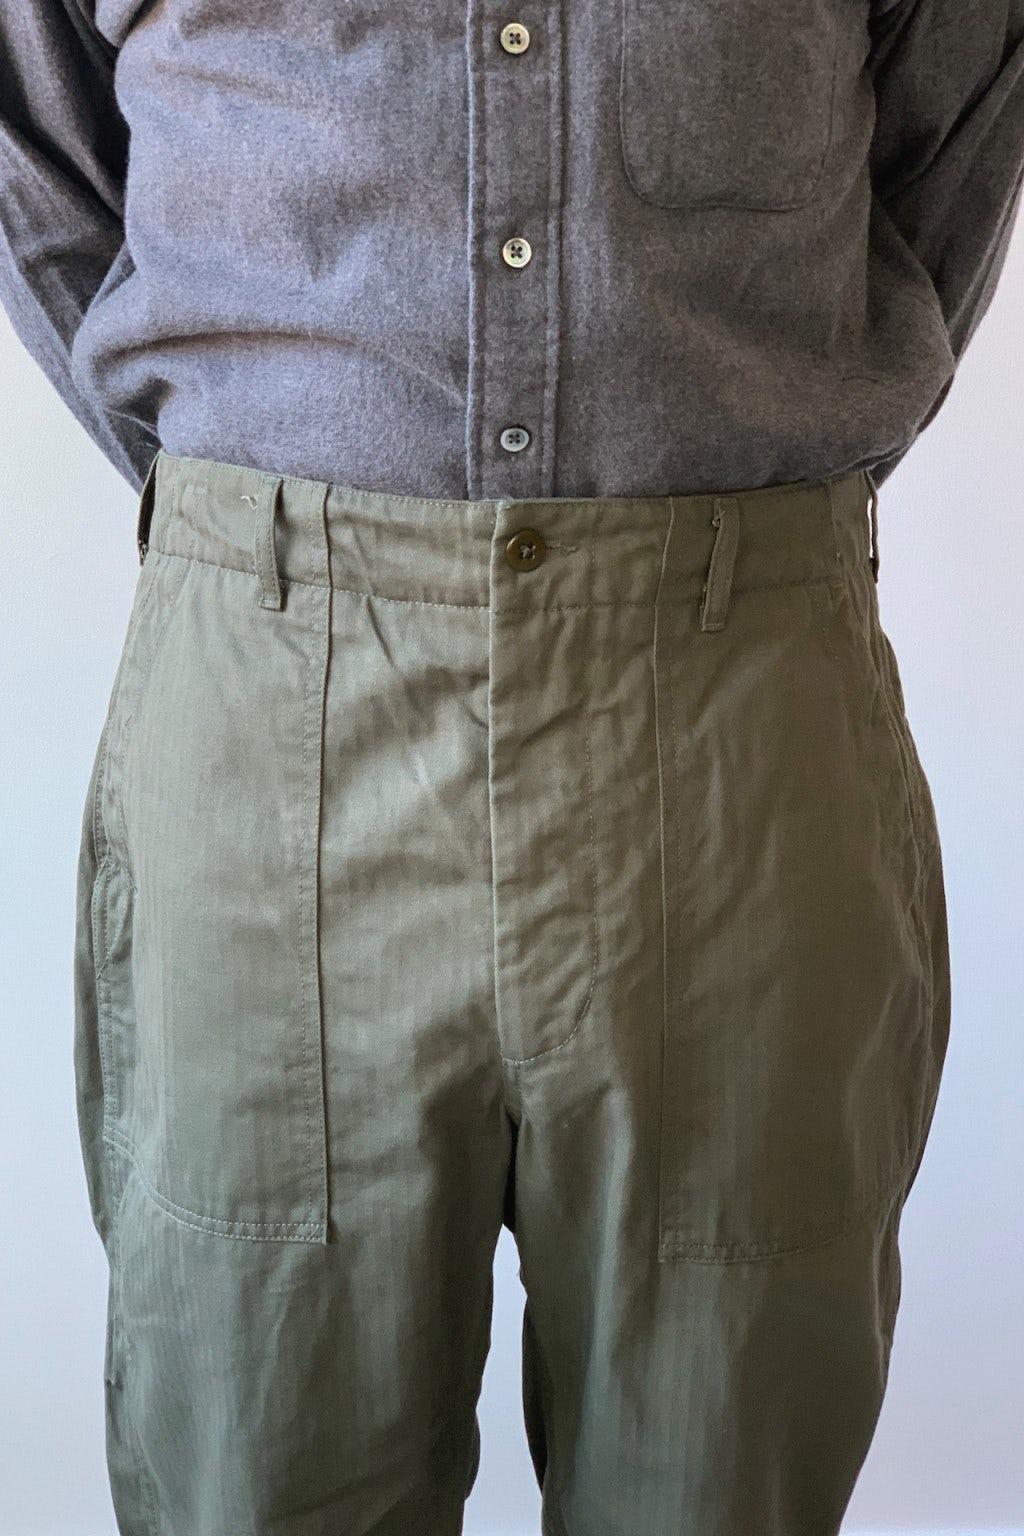 Engineered Garments Fatigue Pant Olive Cotton Herringbone Twill